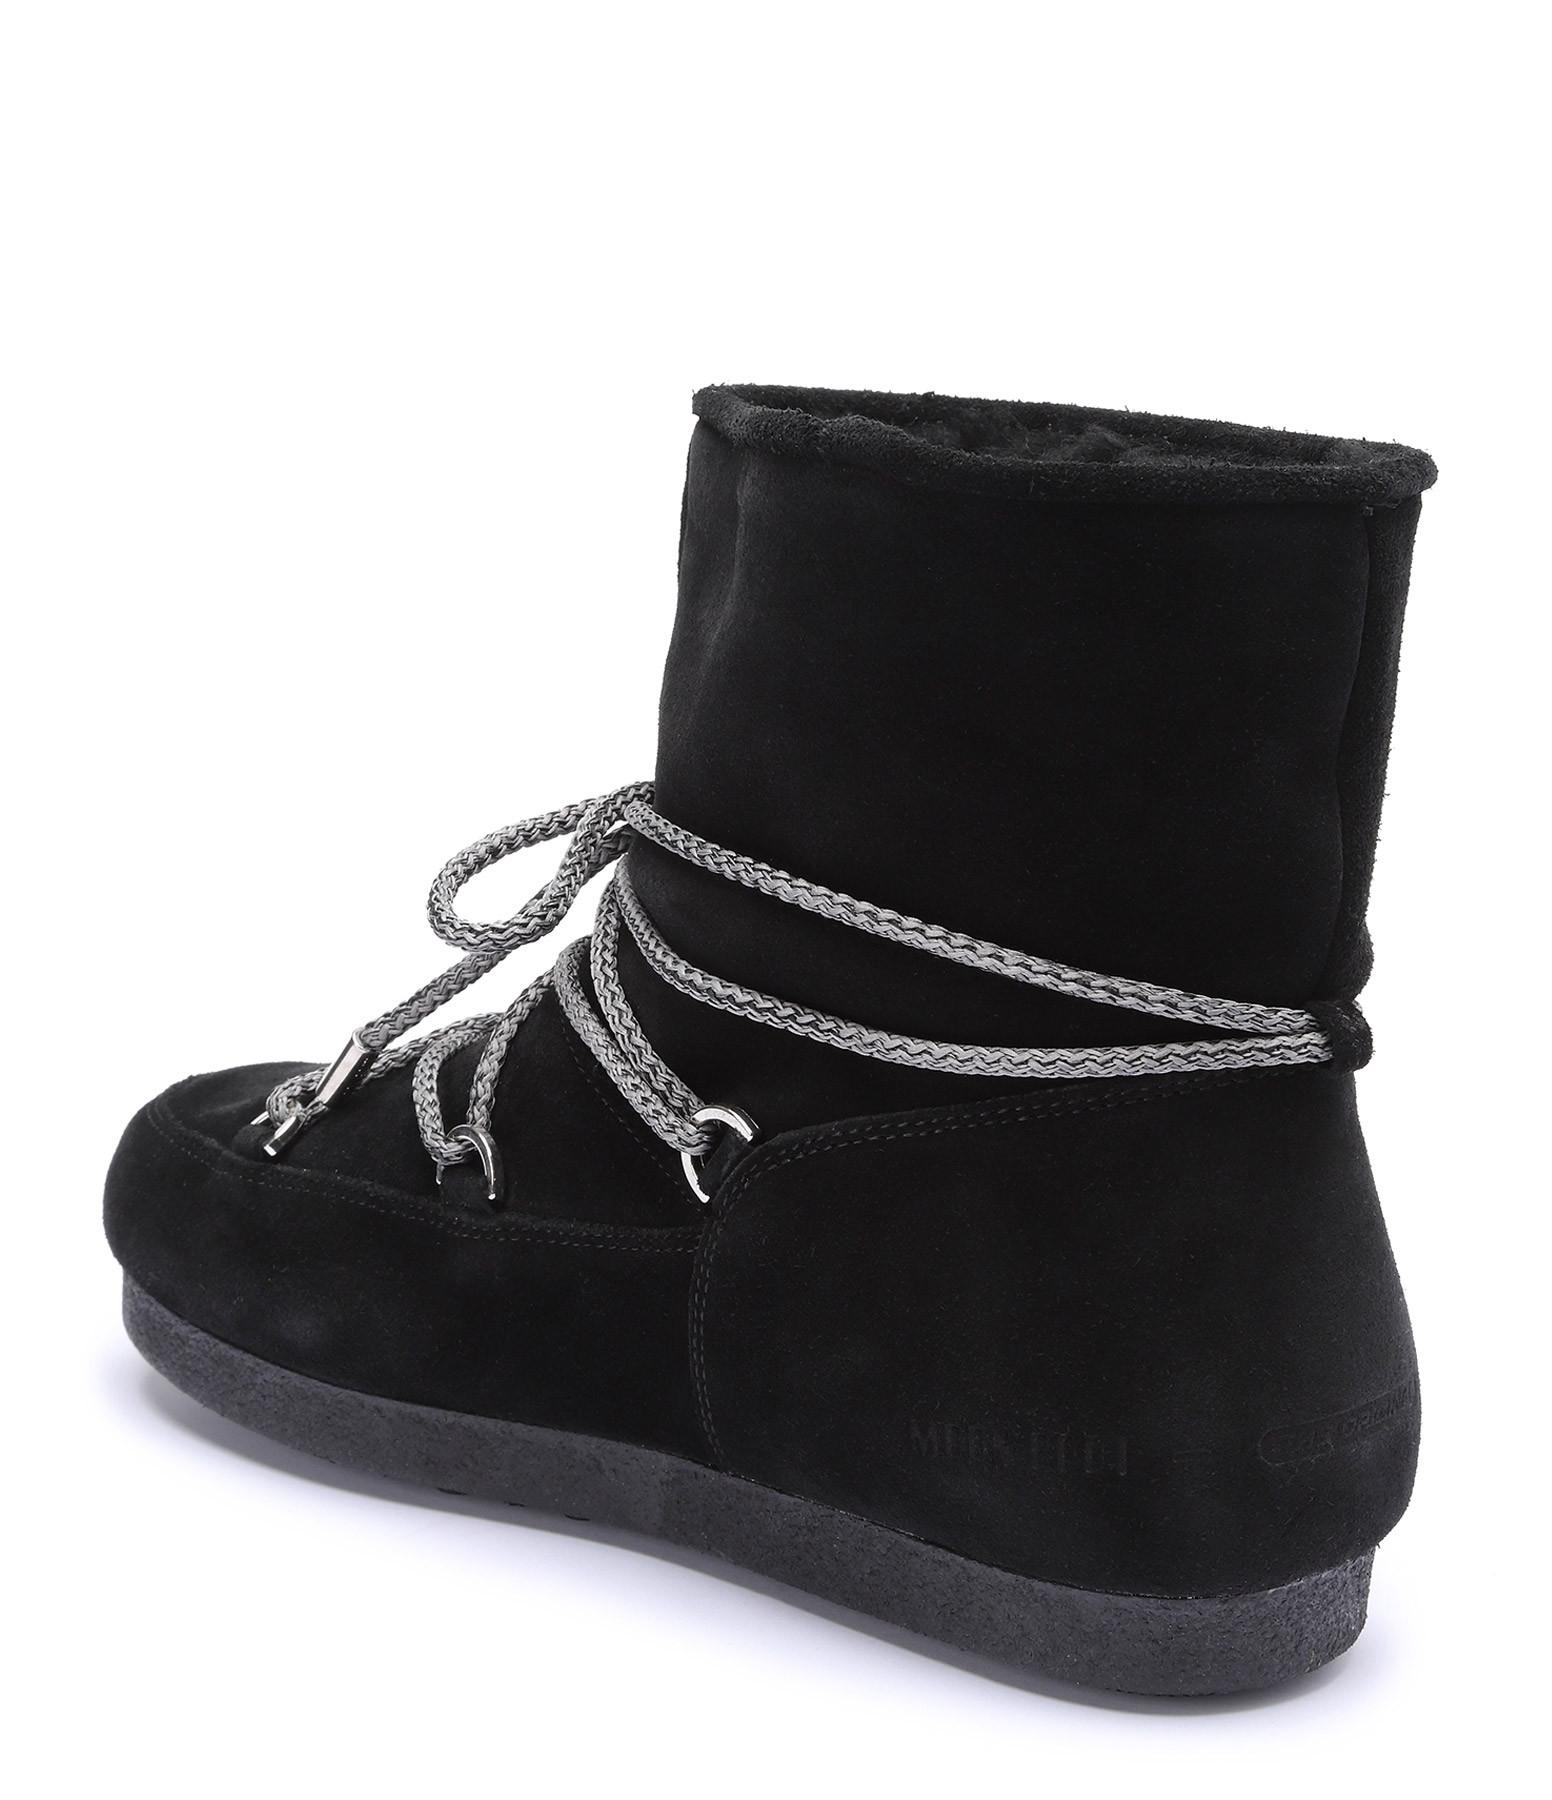 MOON BOOT - Moon Boot Basses Far Side Noir